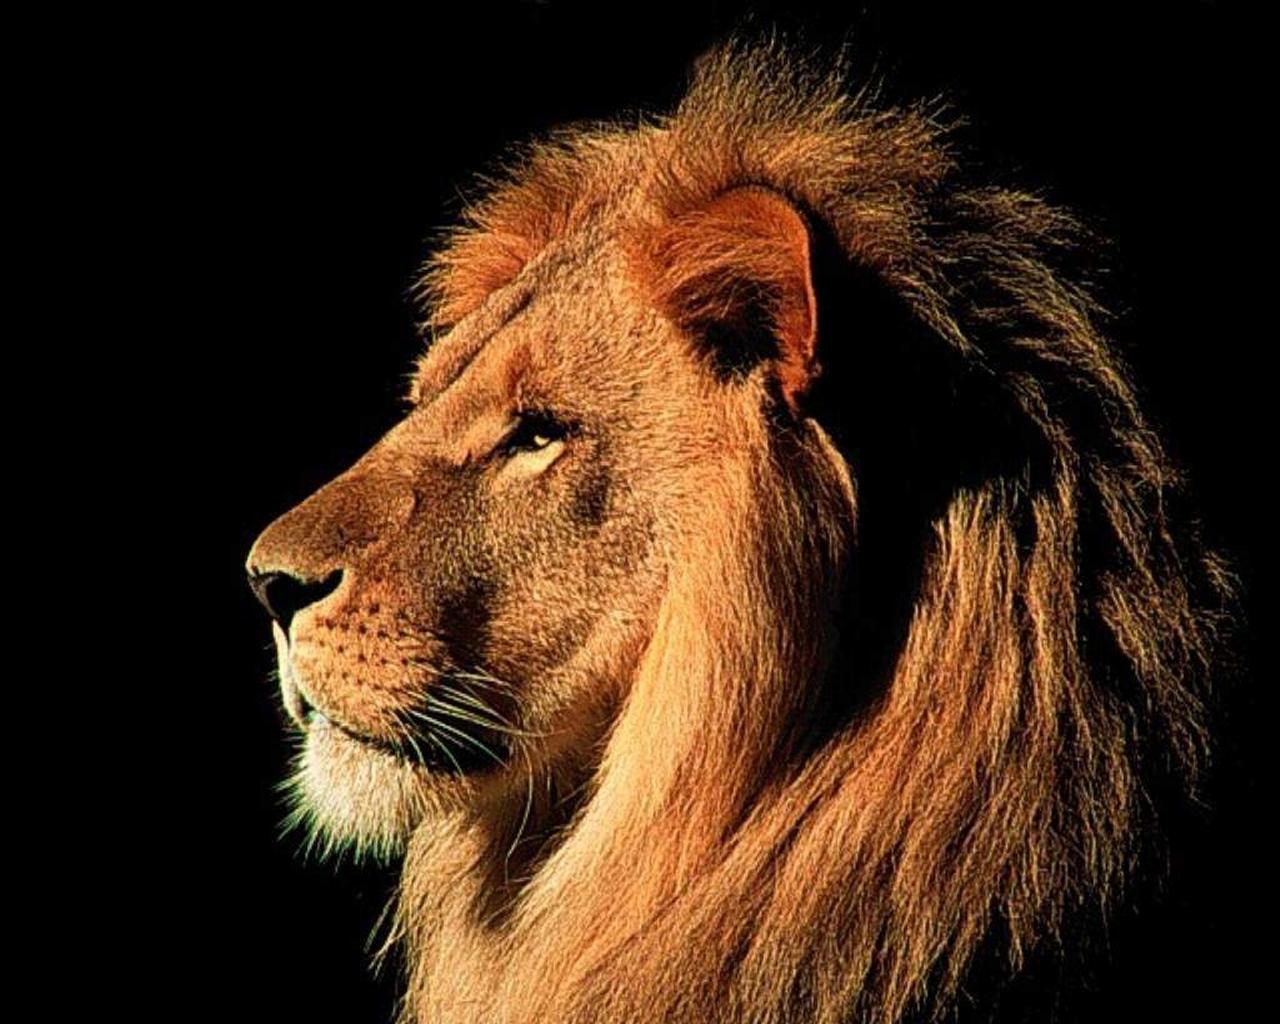 Wonderful   Wallpaper Horse Lion - 1+(1)  Photograph_429177.jpg